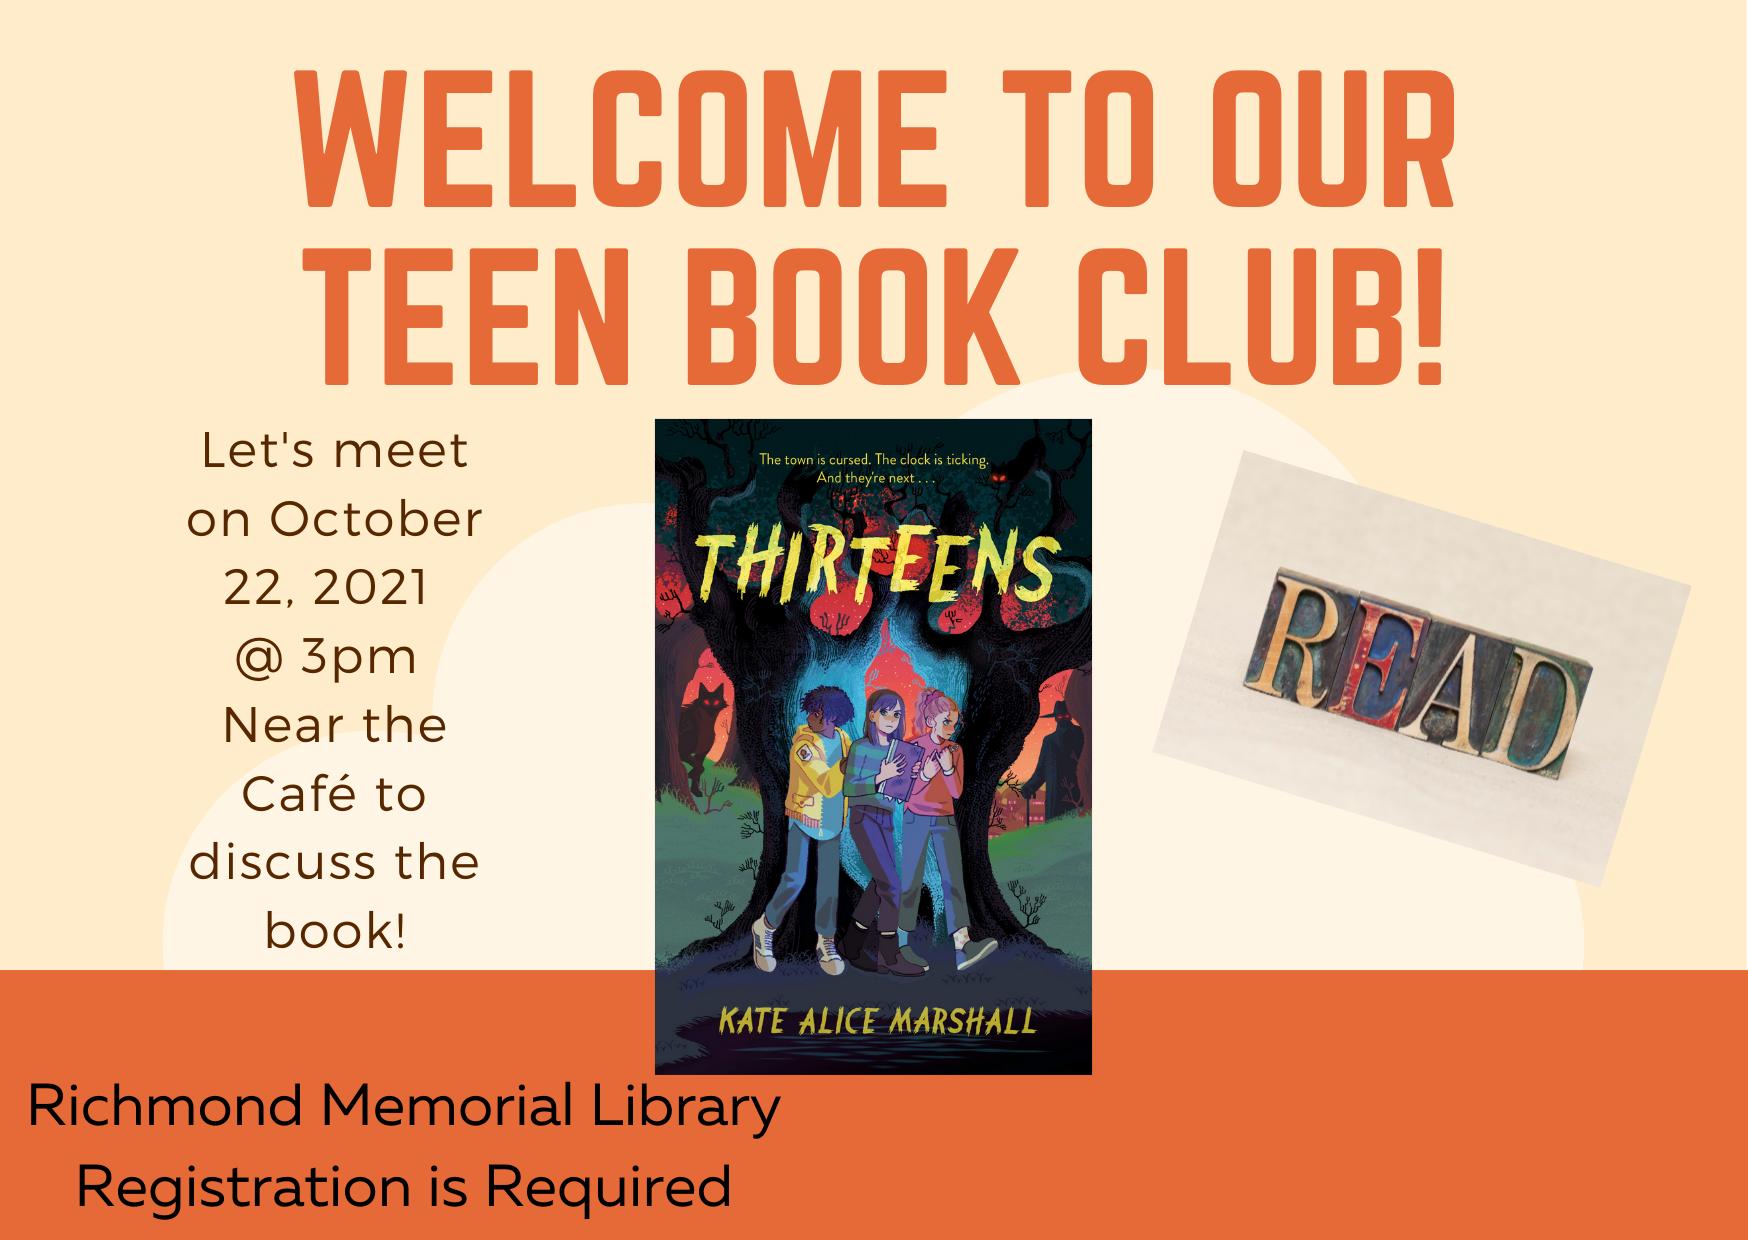 Teens October Book Club - Thirteens by Kate Alice Marshall